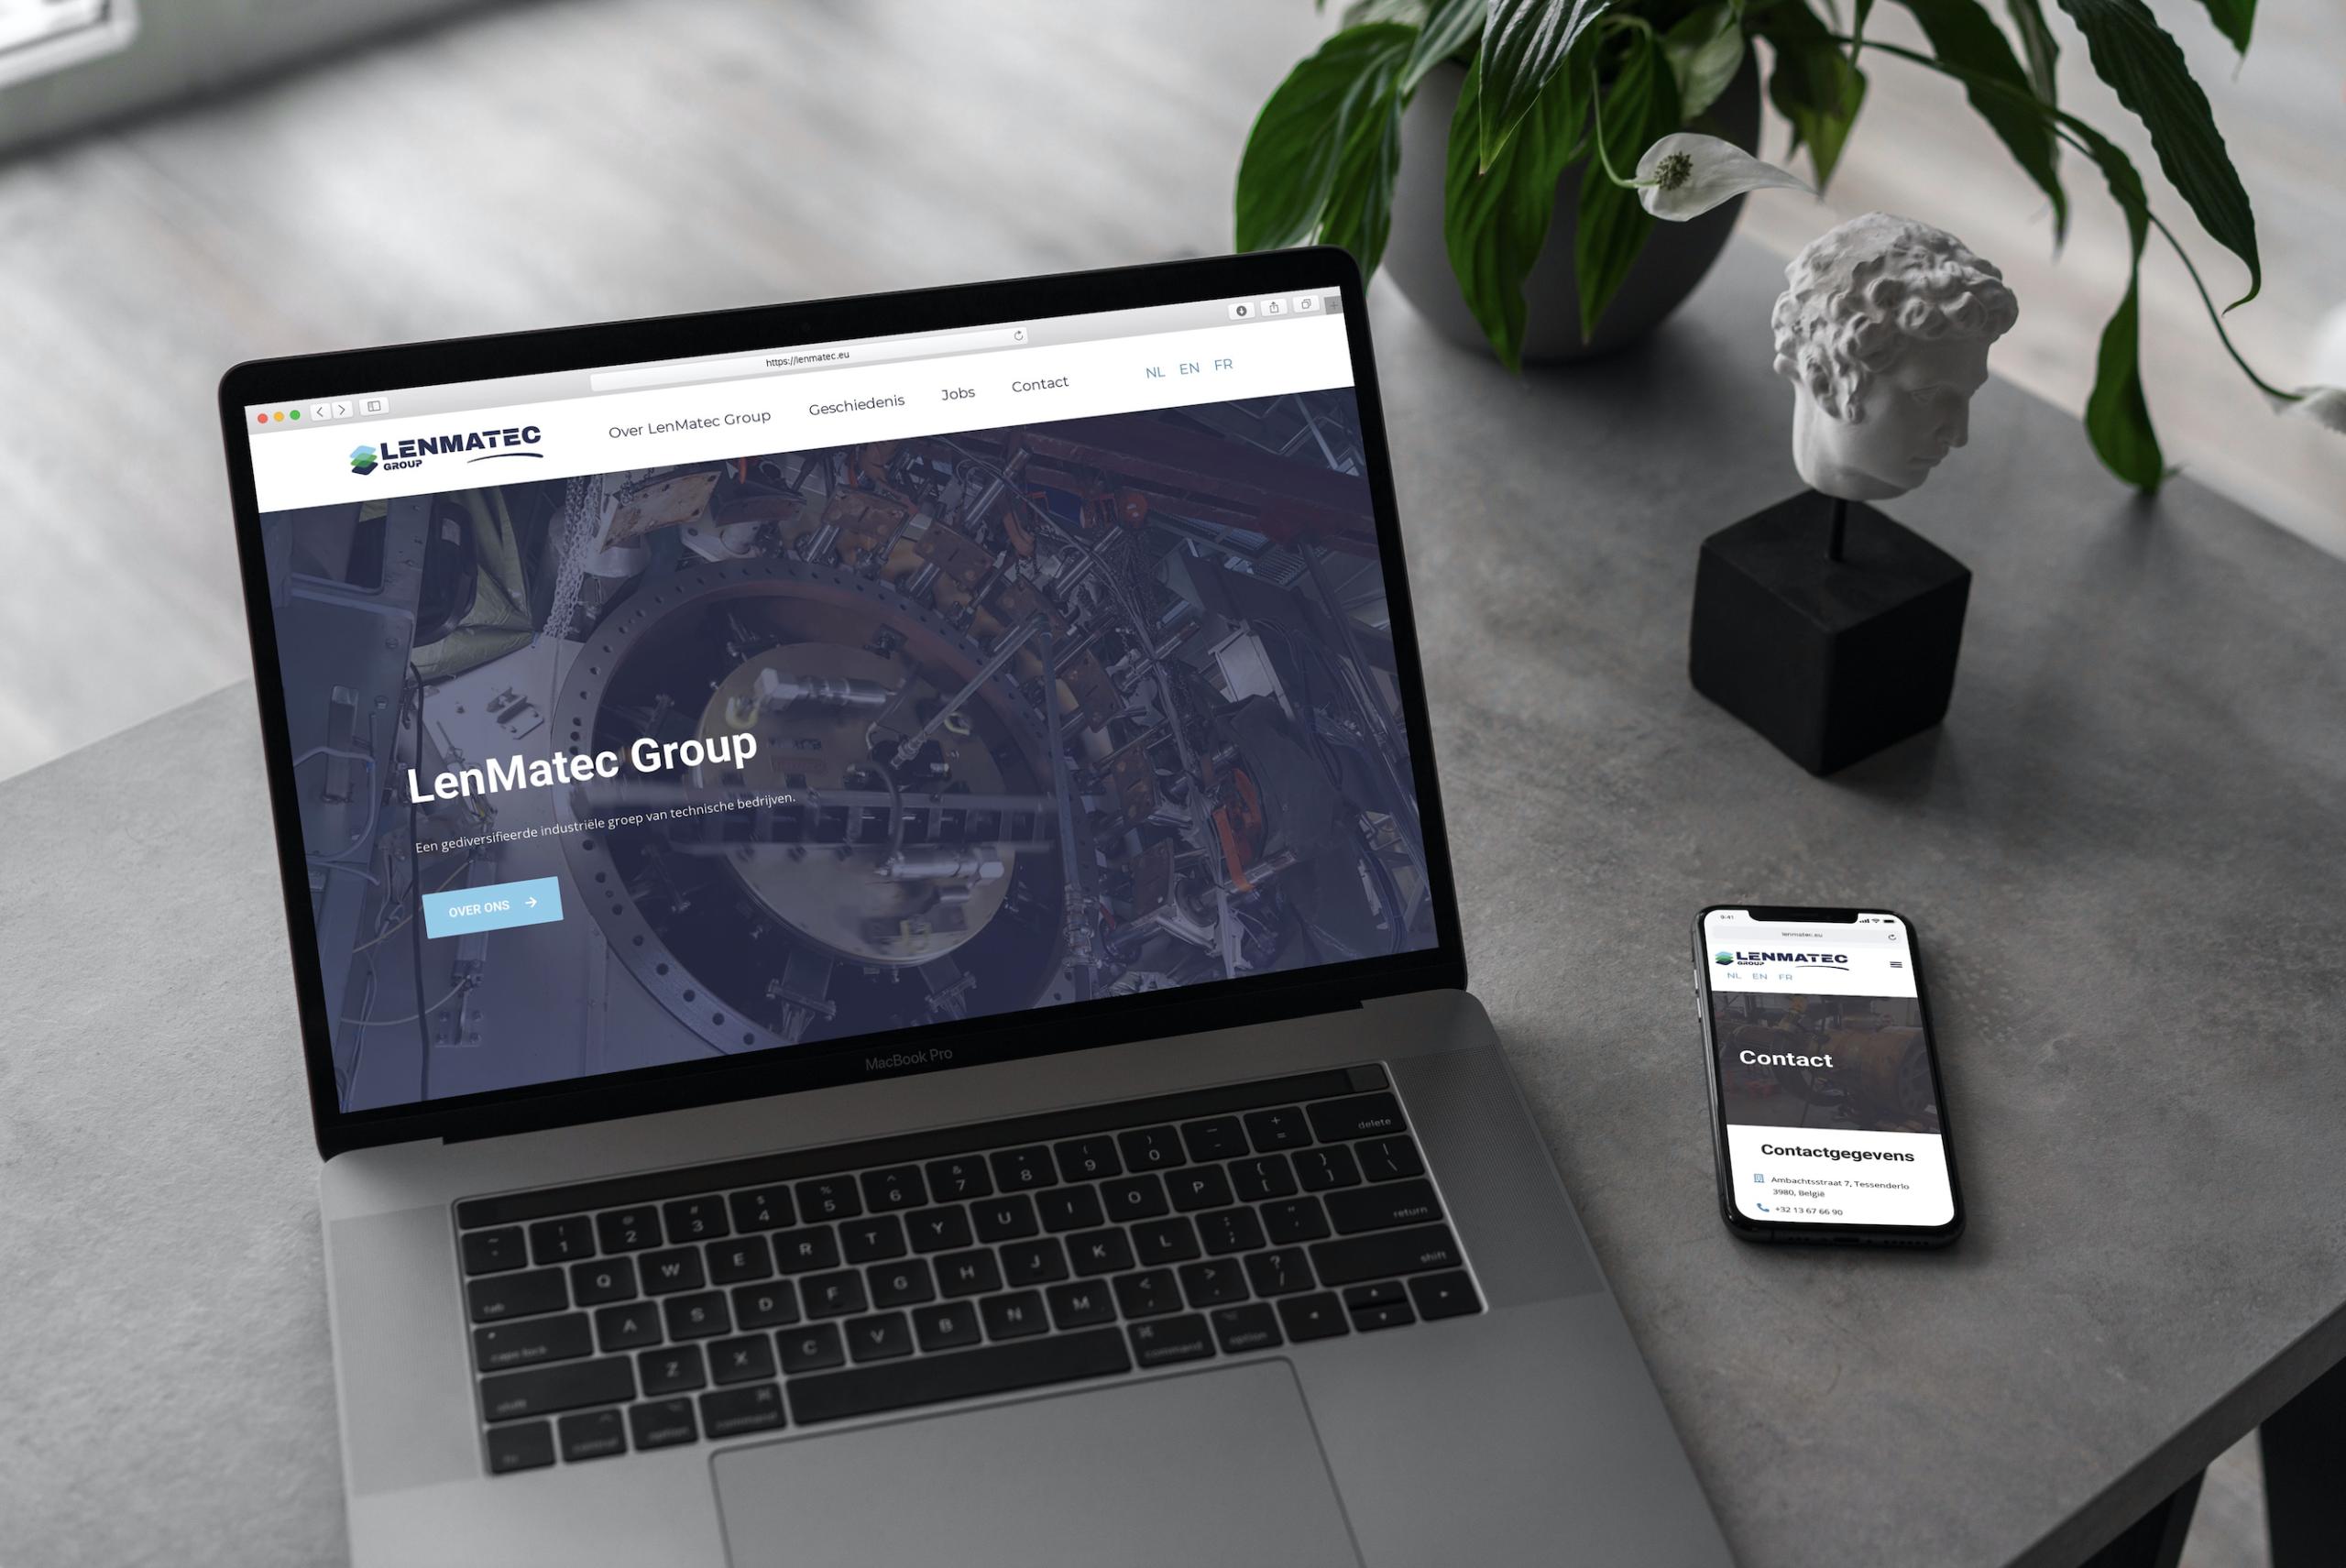 LenMatec Group